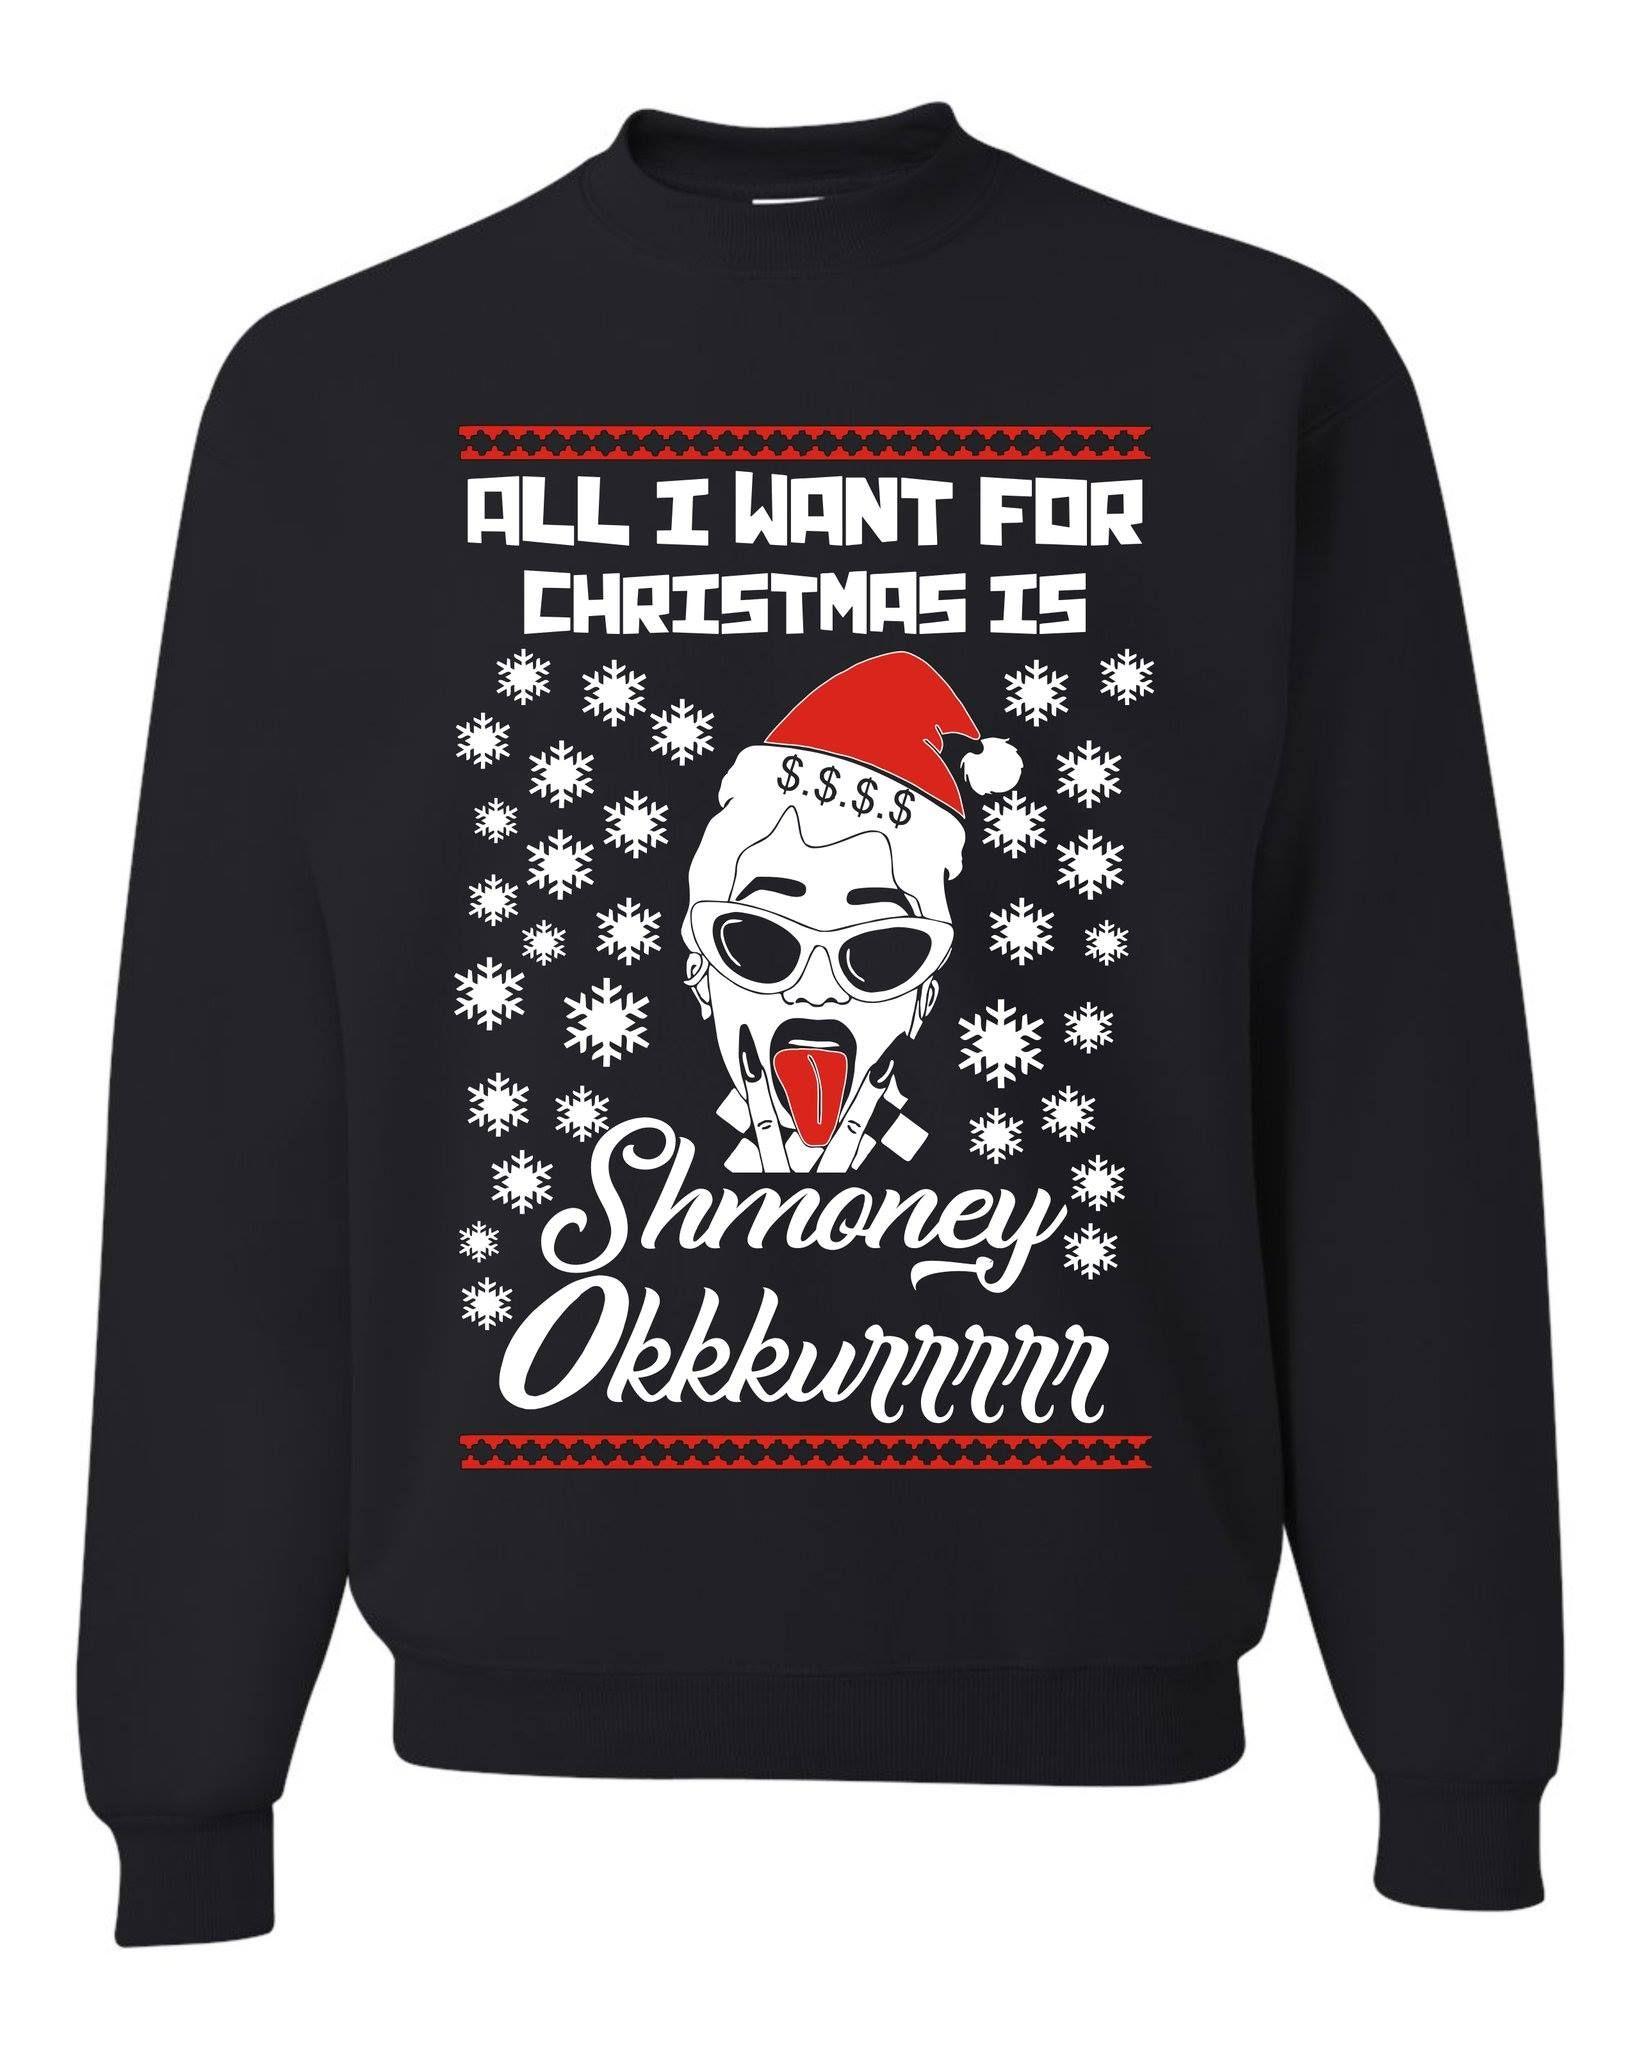 All I Want for Christmas are Diamonds Funny Xmas Unisex Sweatshirt tee